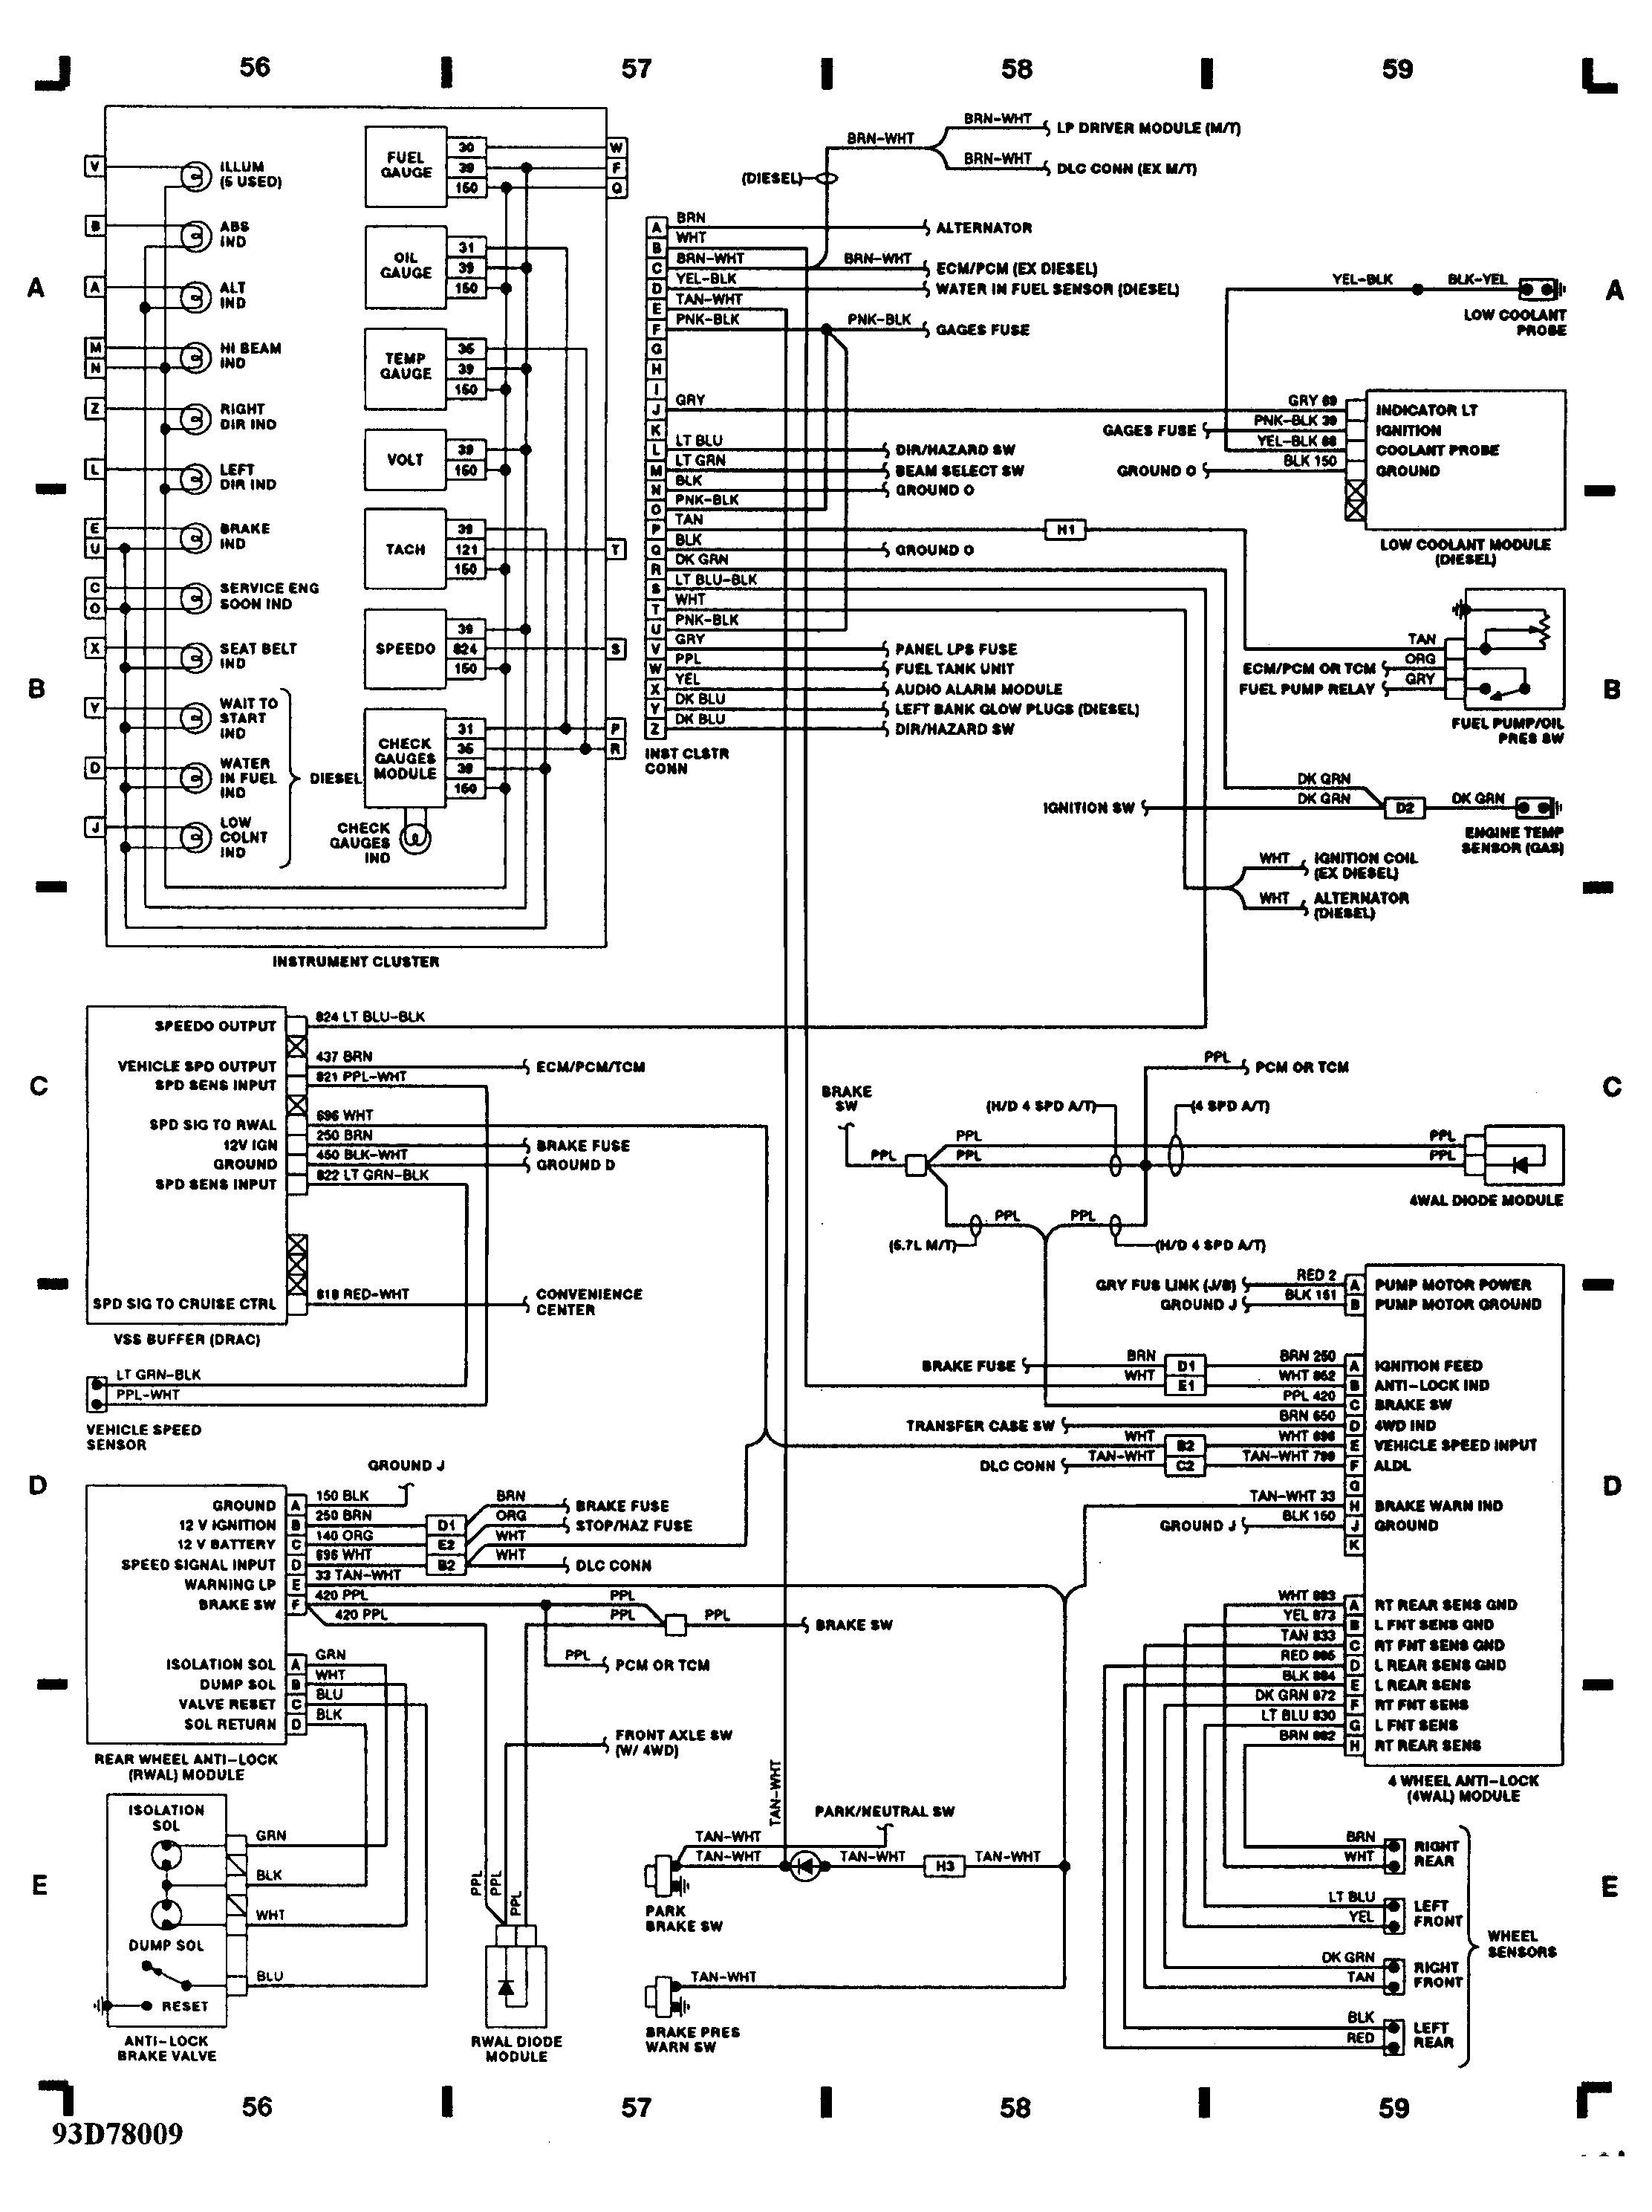 wiring diagram 1993 chevy silverado 1500 wiring diagram files wiring diagram for 1993 chevy silverado wiring diagram for 1993 chevy silverado